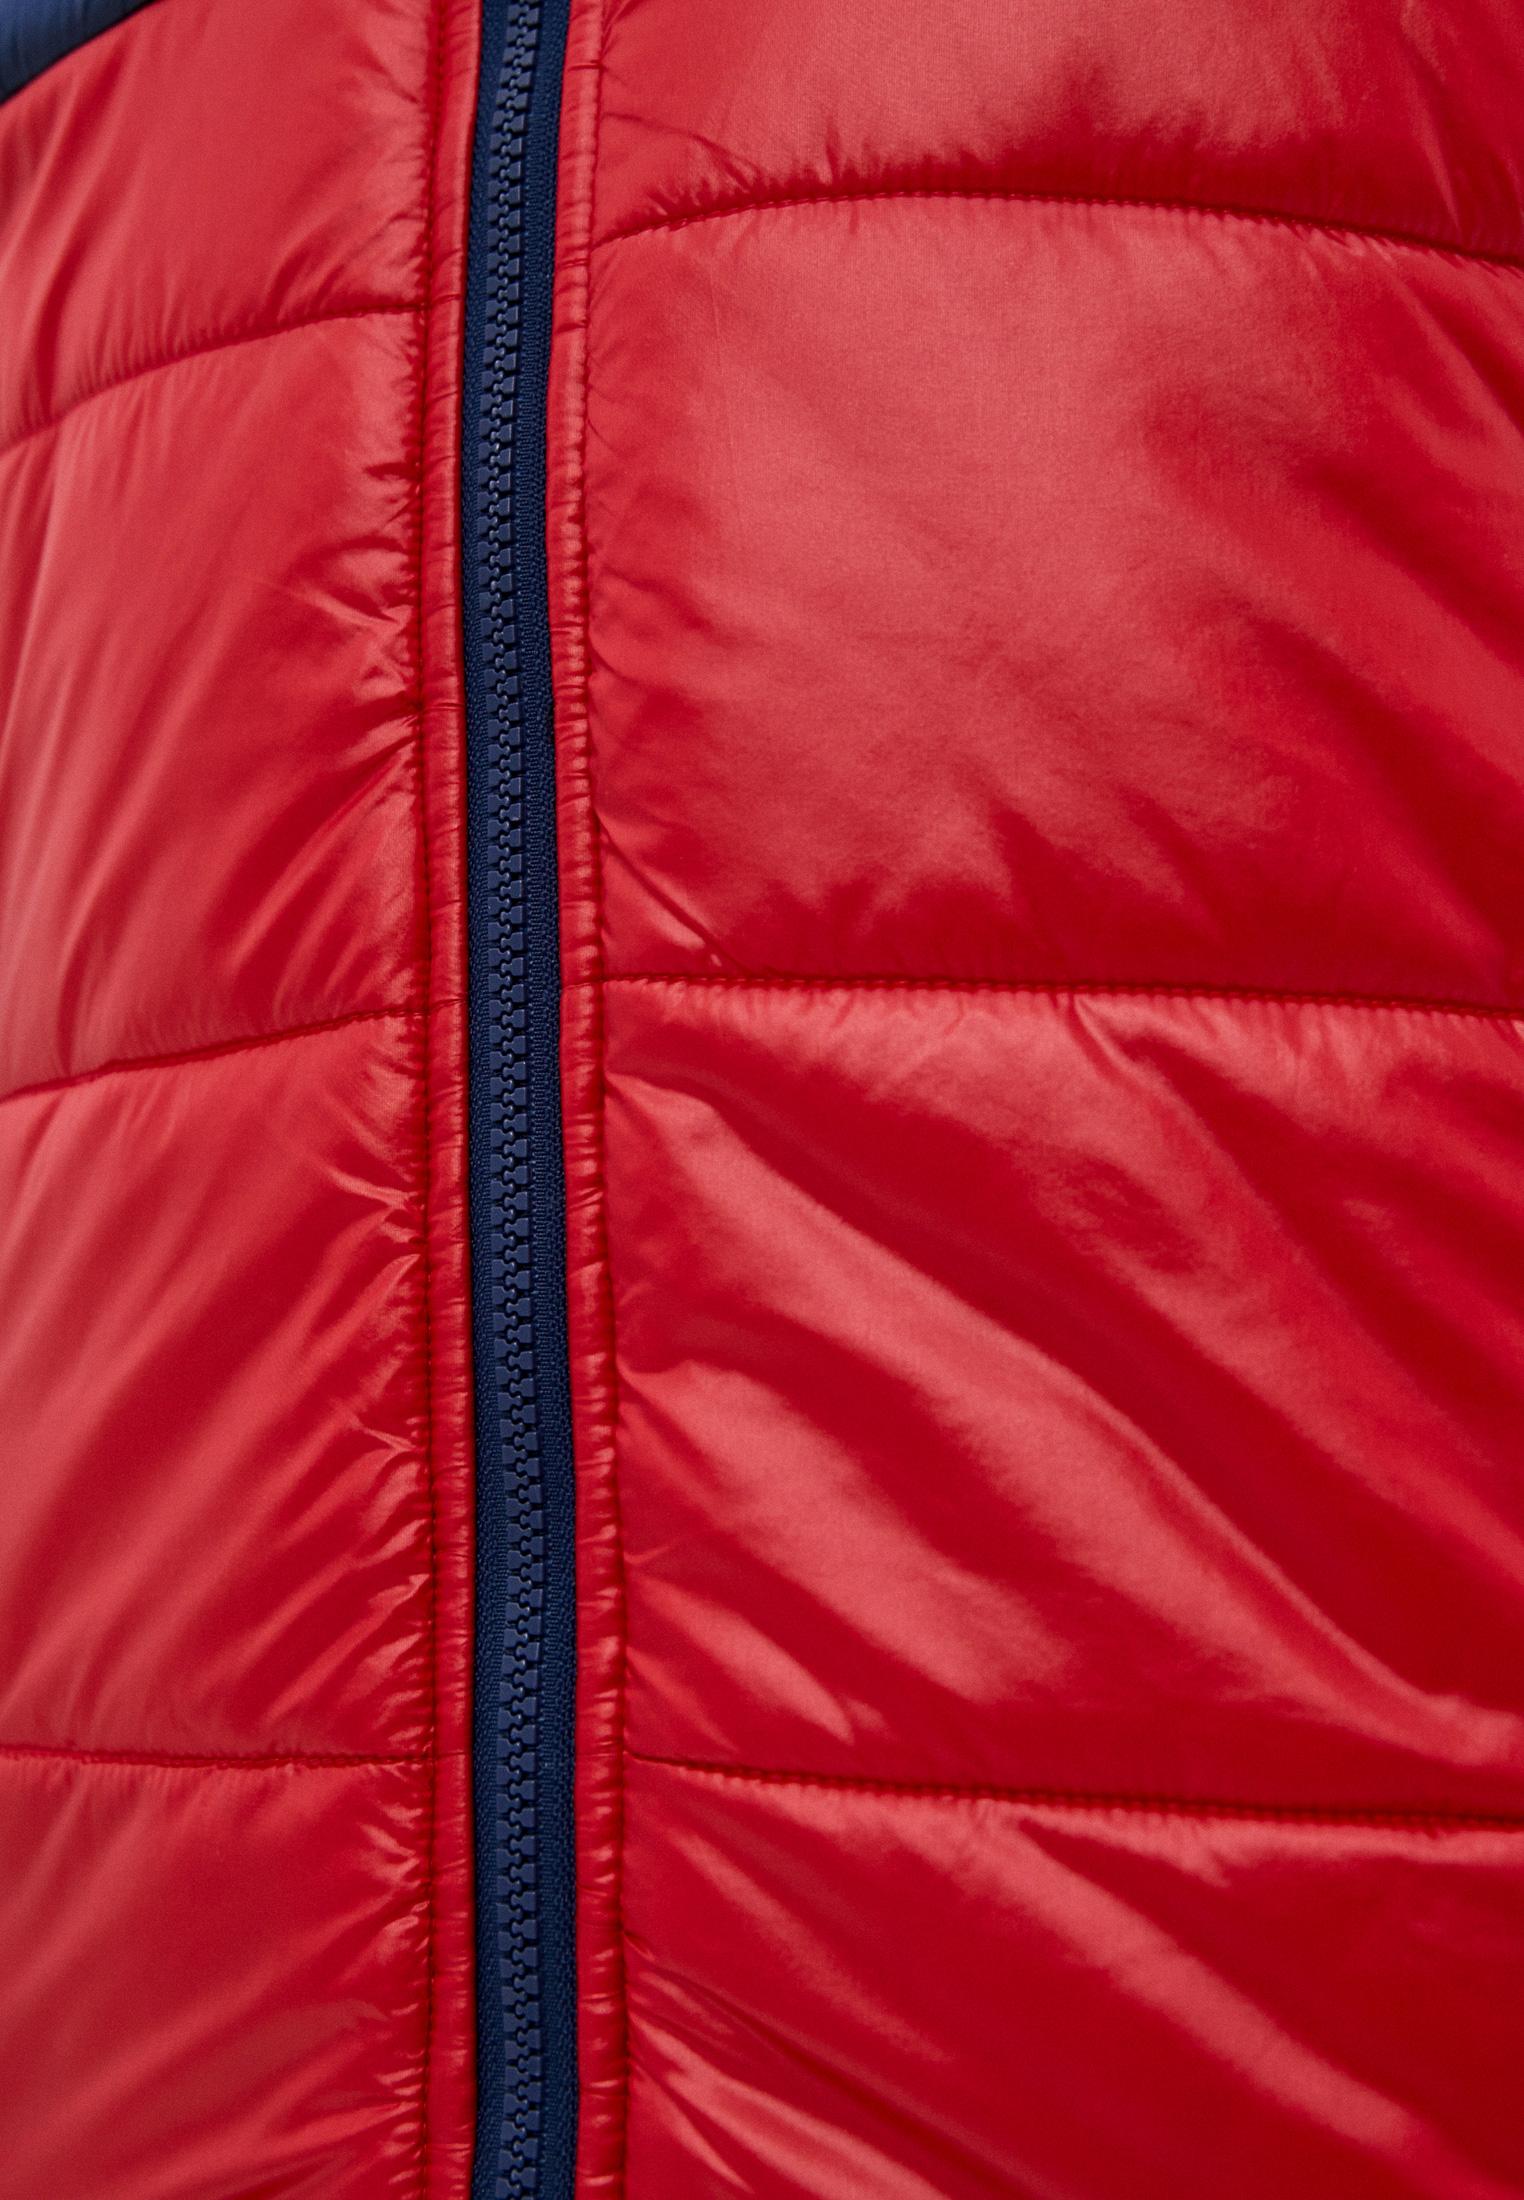 Мужская куртка Bikkembergs (Биккембергс) C H 090 00 T 9846: изображение 12